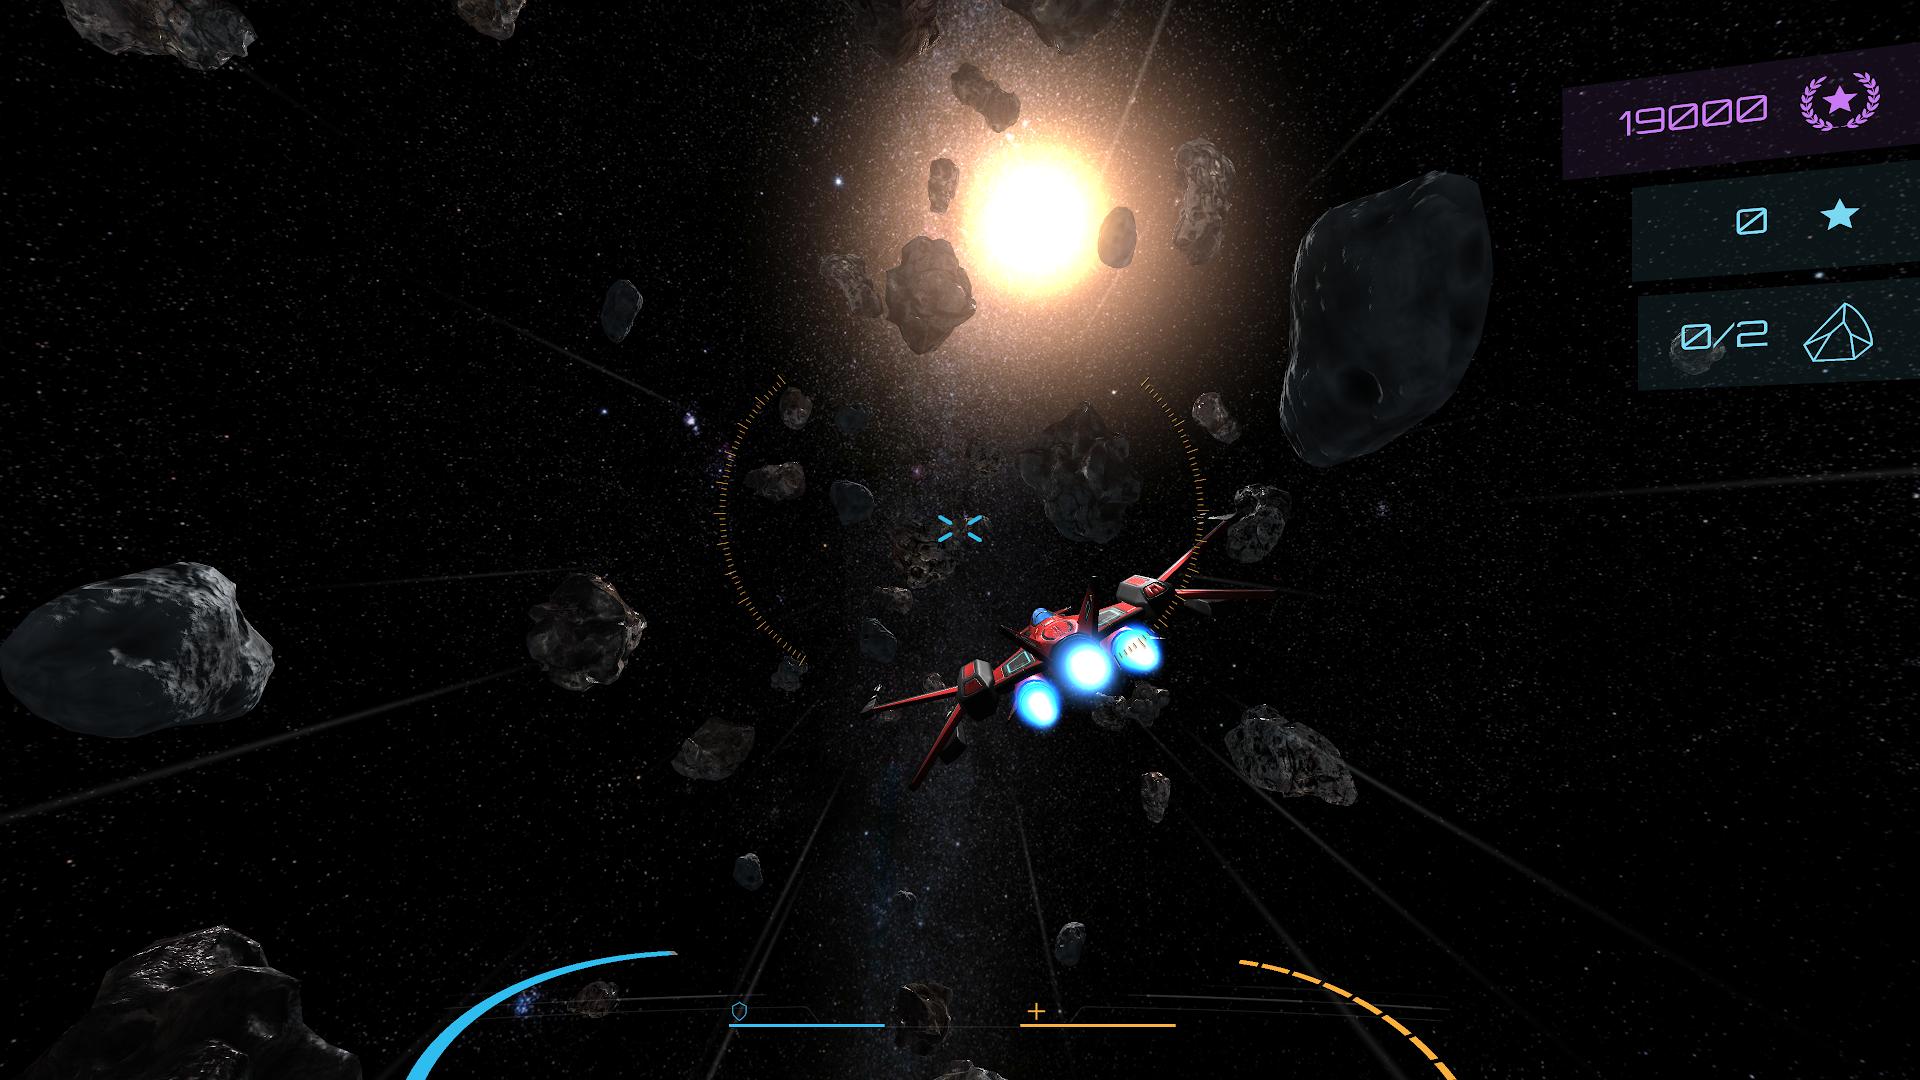 SpaceBattlePrototype